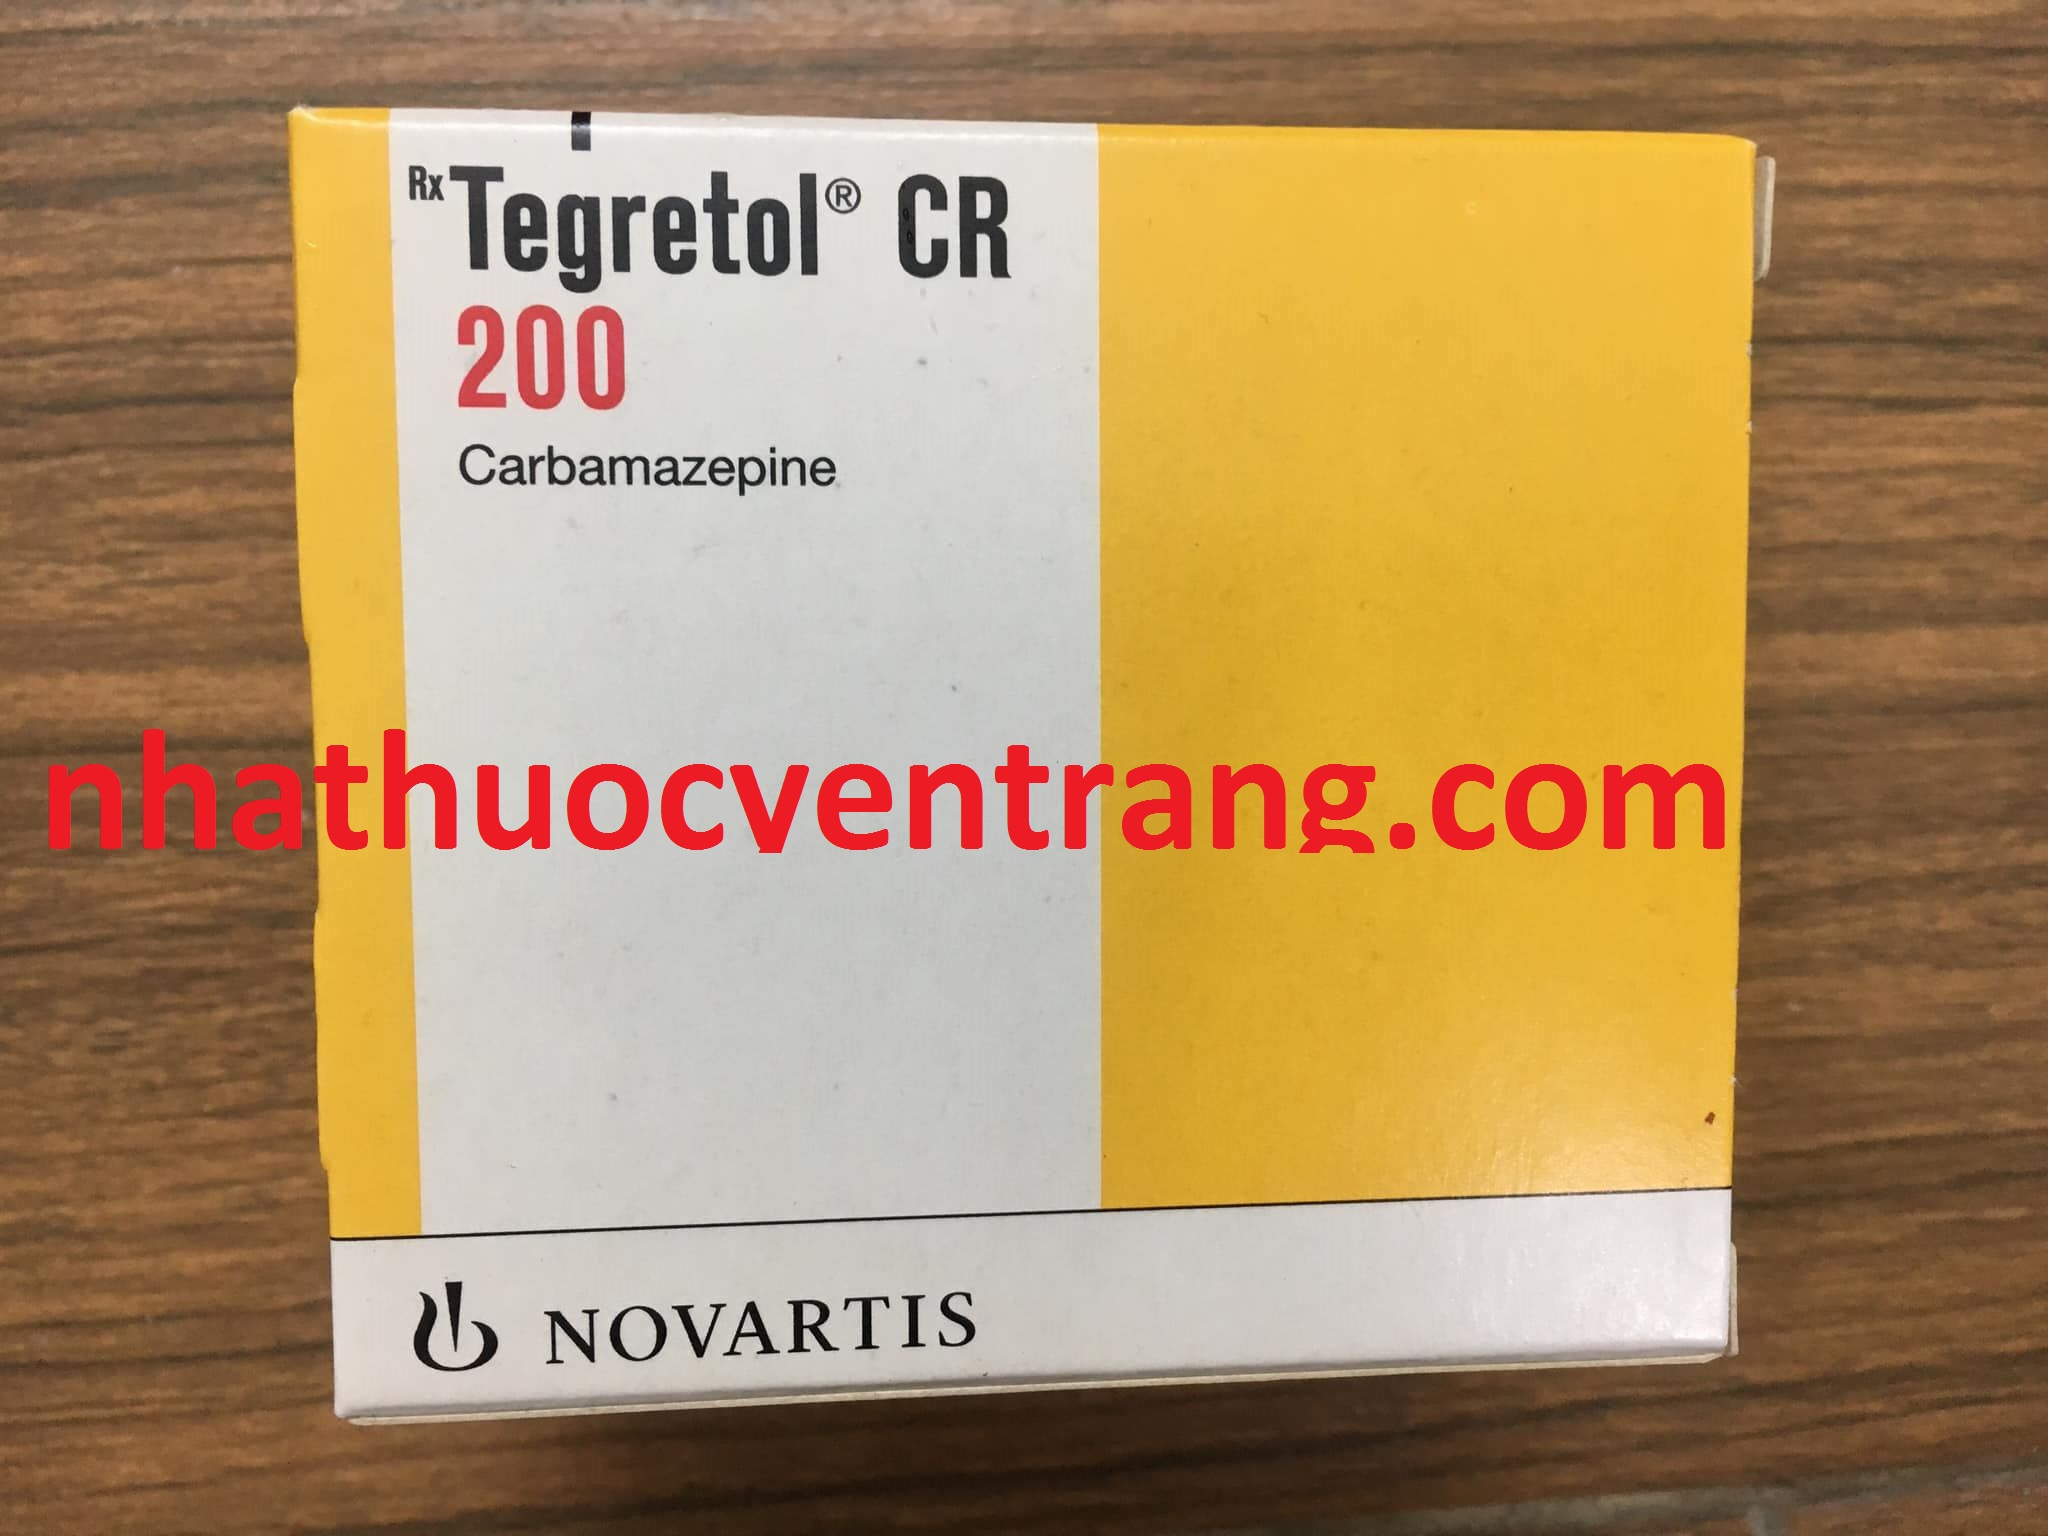 Tegretol CR